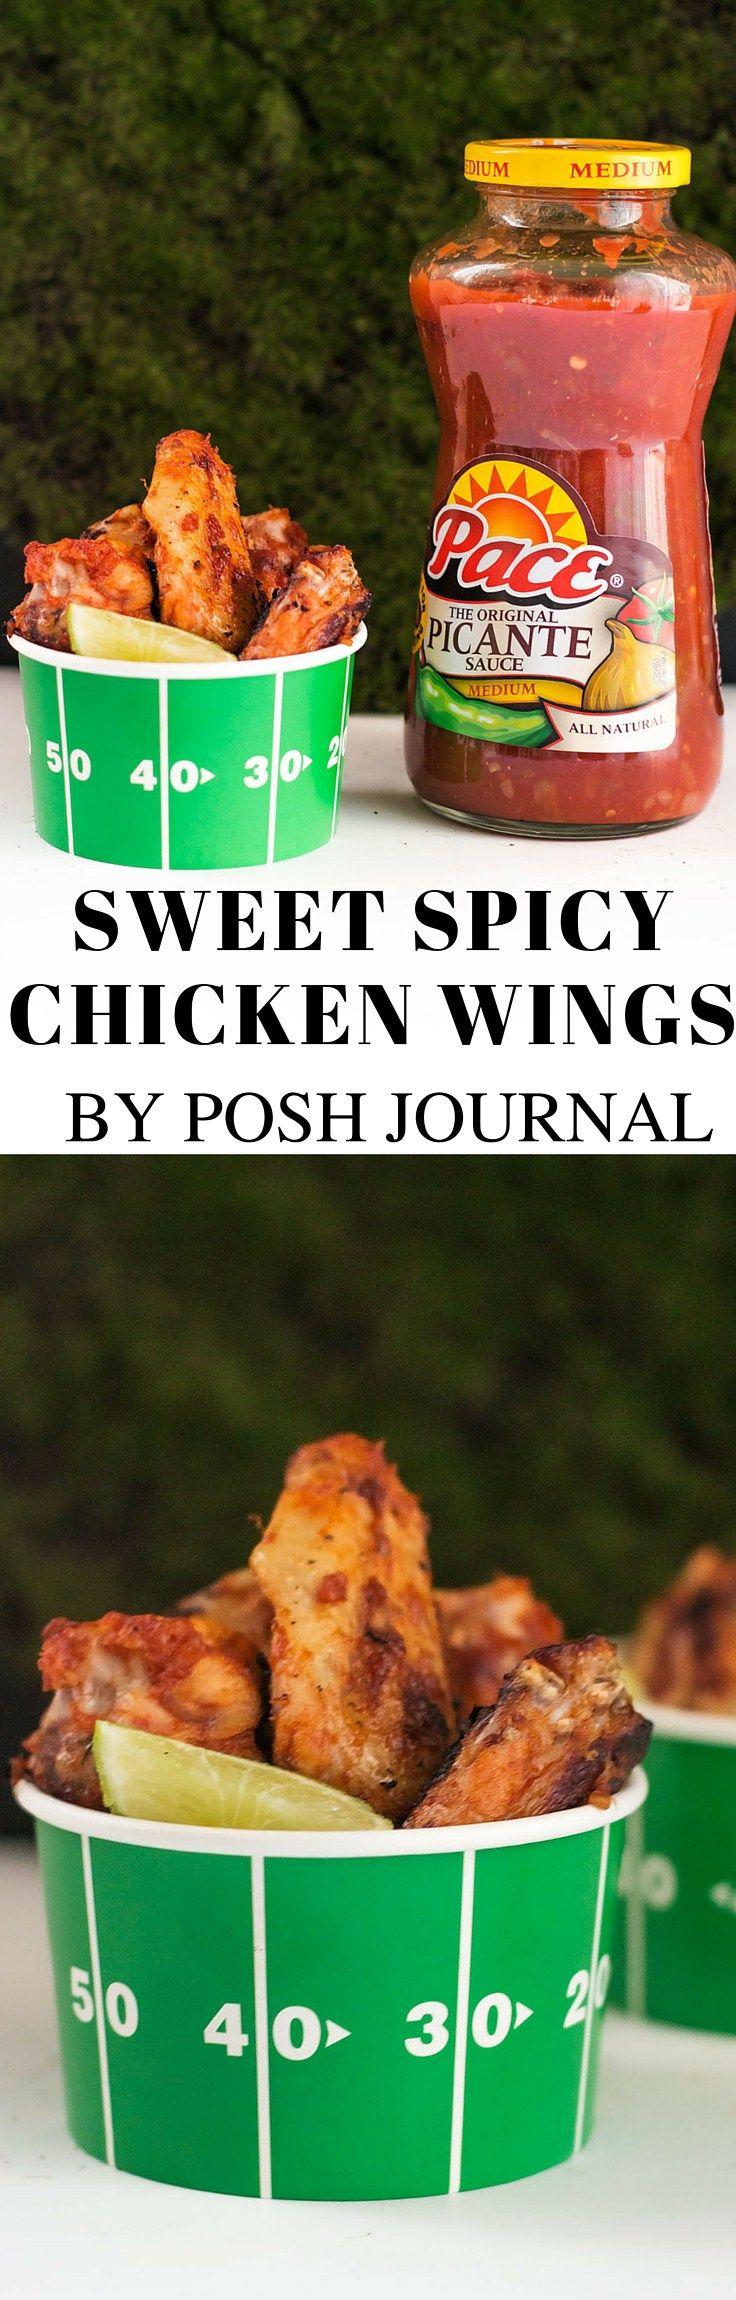 Sweet Spicy Chicken Wings - Best Gameday Food - Posh Journal  #KickUpTheFlavor #CollectiveBias #ad